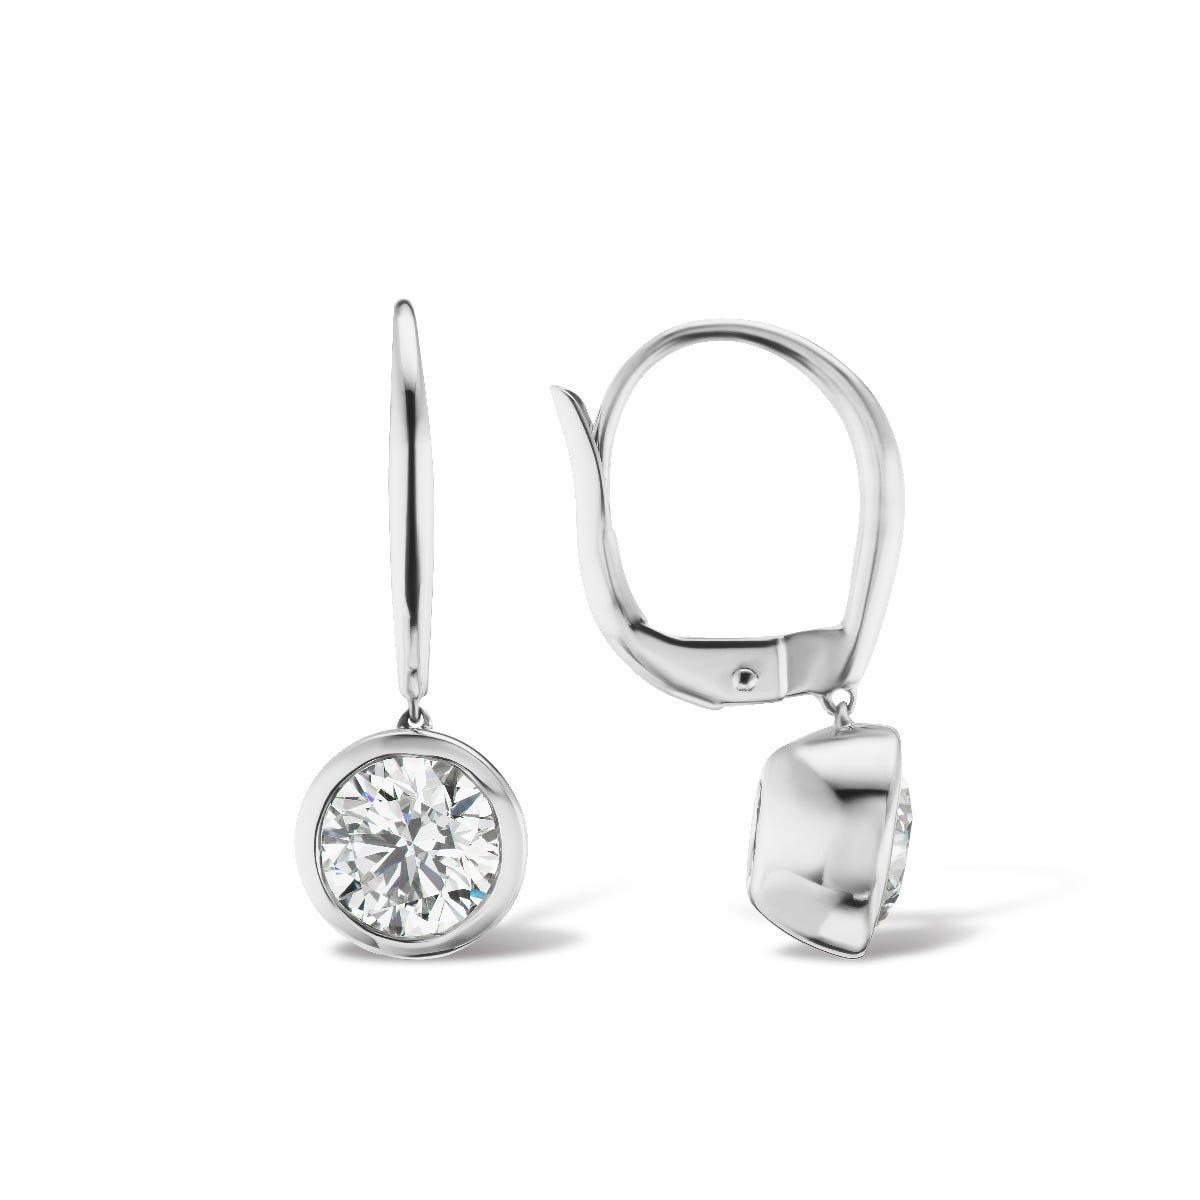 Lab Grown 1ct. Diamond Bezel Set Stud Earrings in 14k White Gold